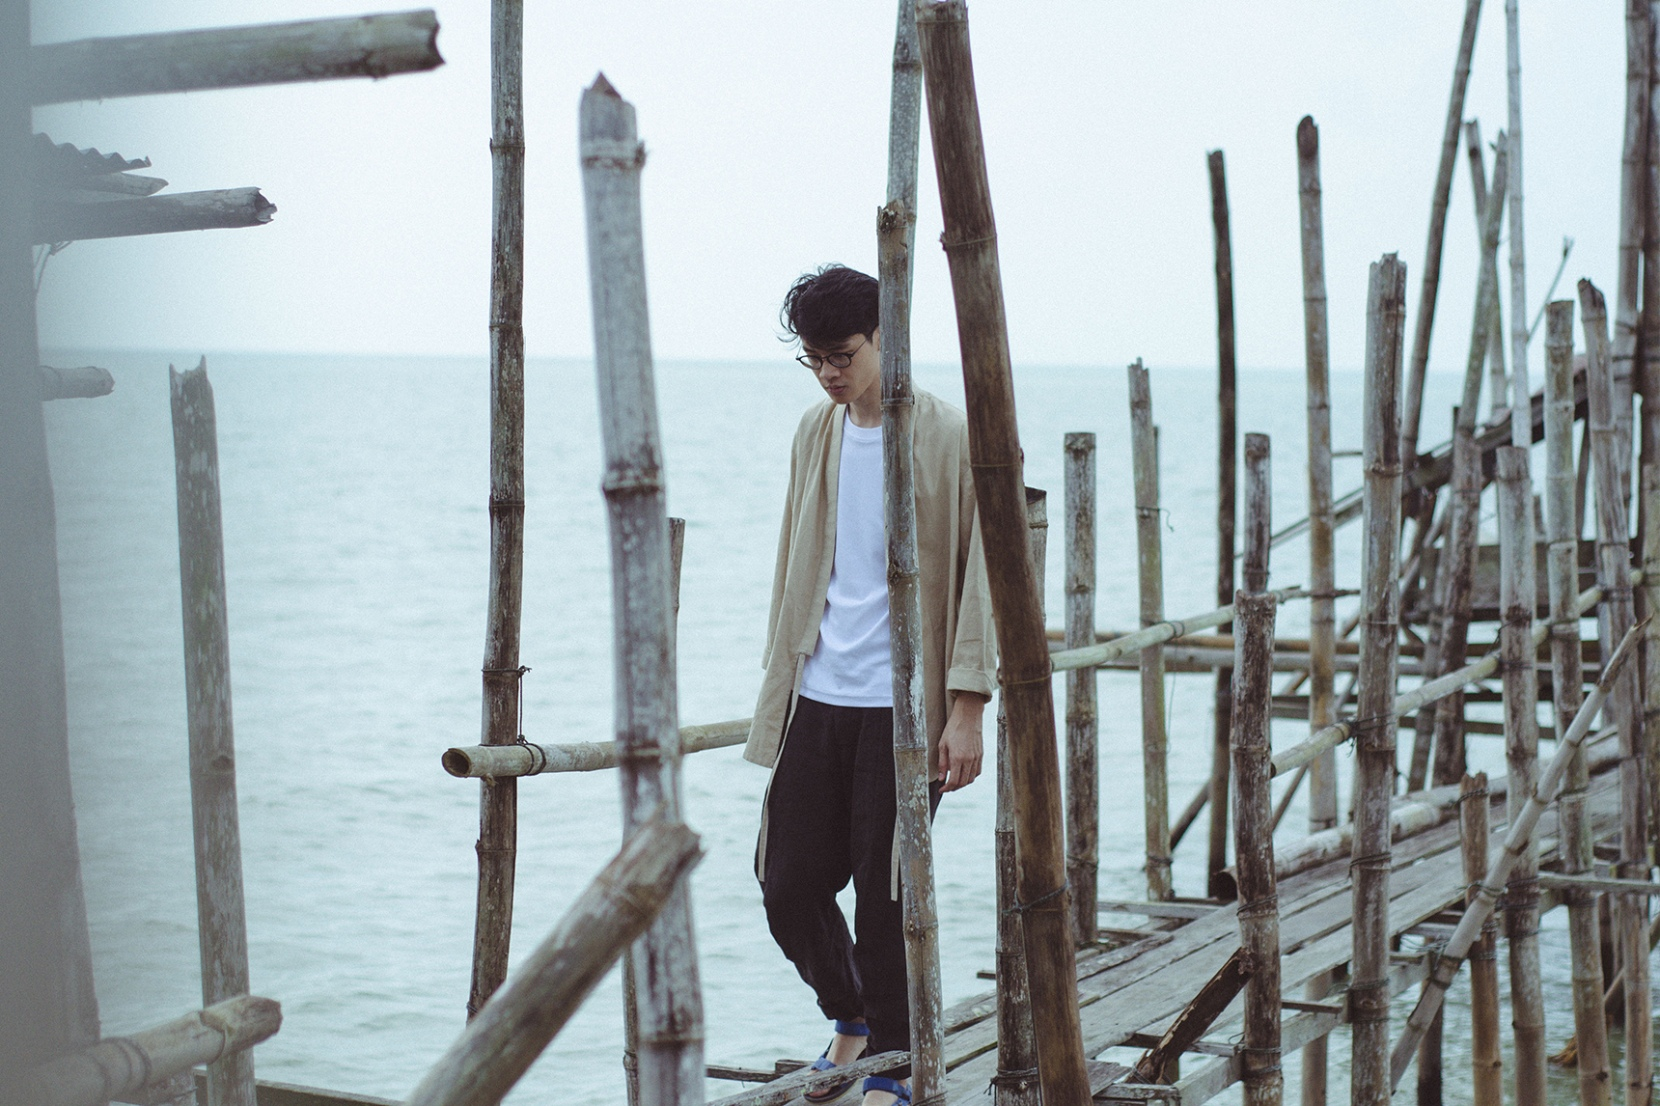 Shuren Projects Presents Their Noragi Lookbook for 2016 - Days of Being Batu